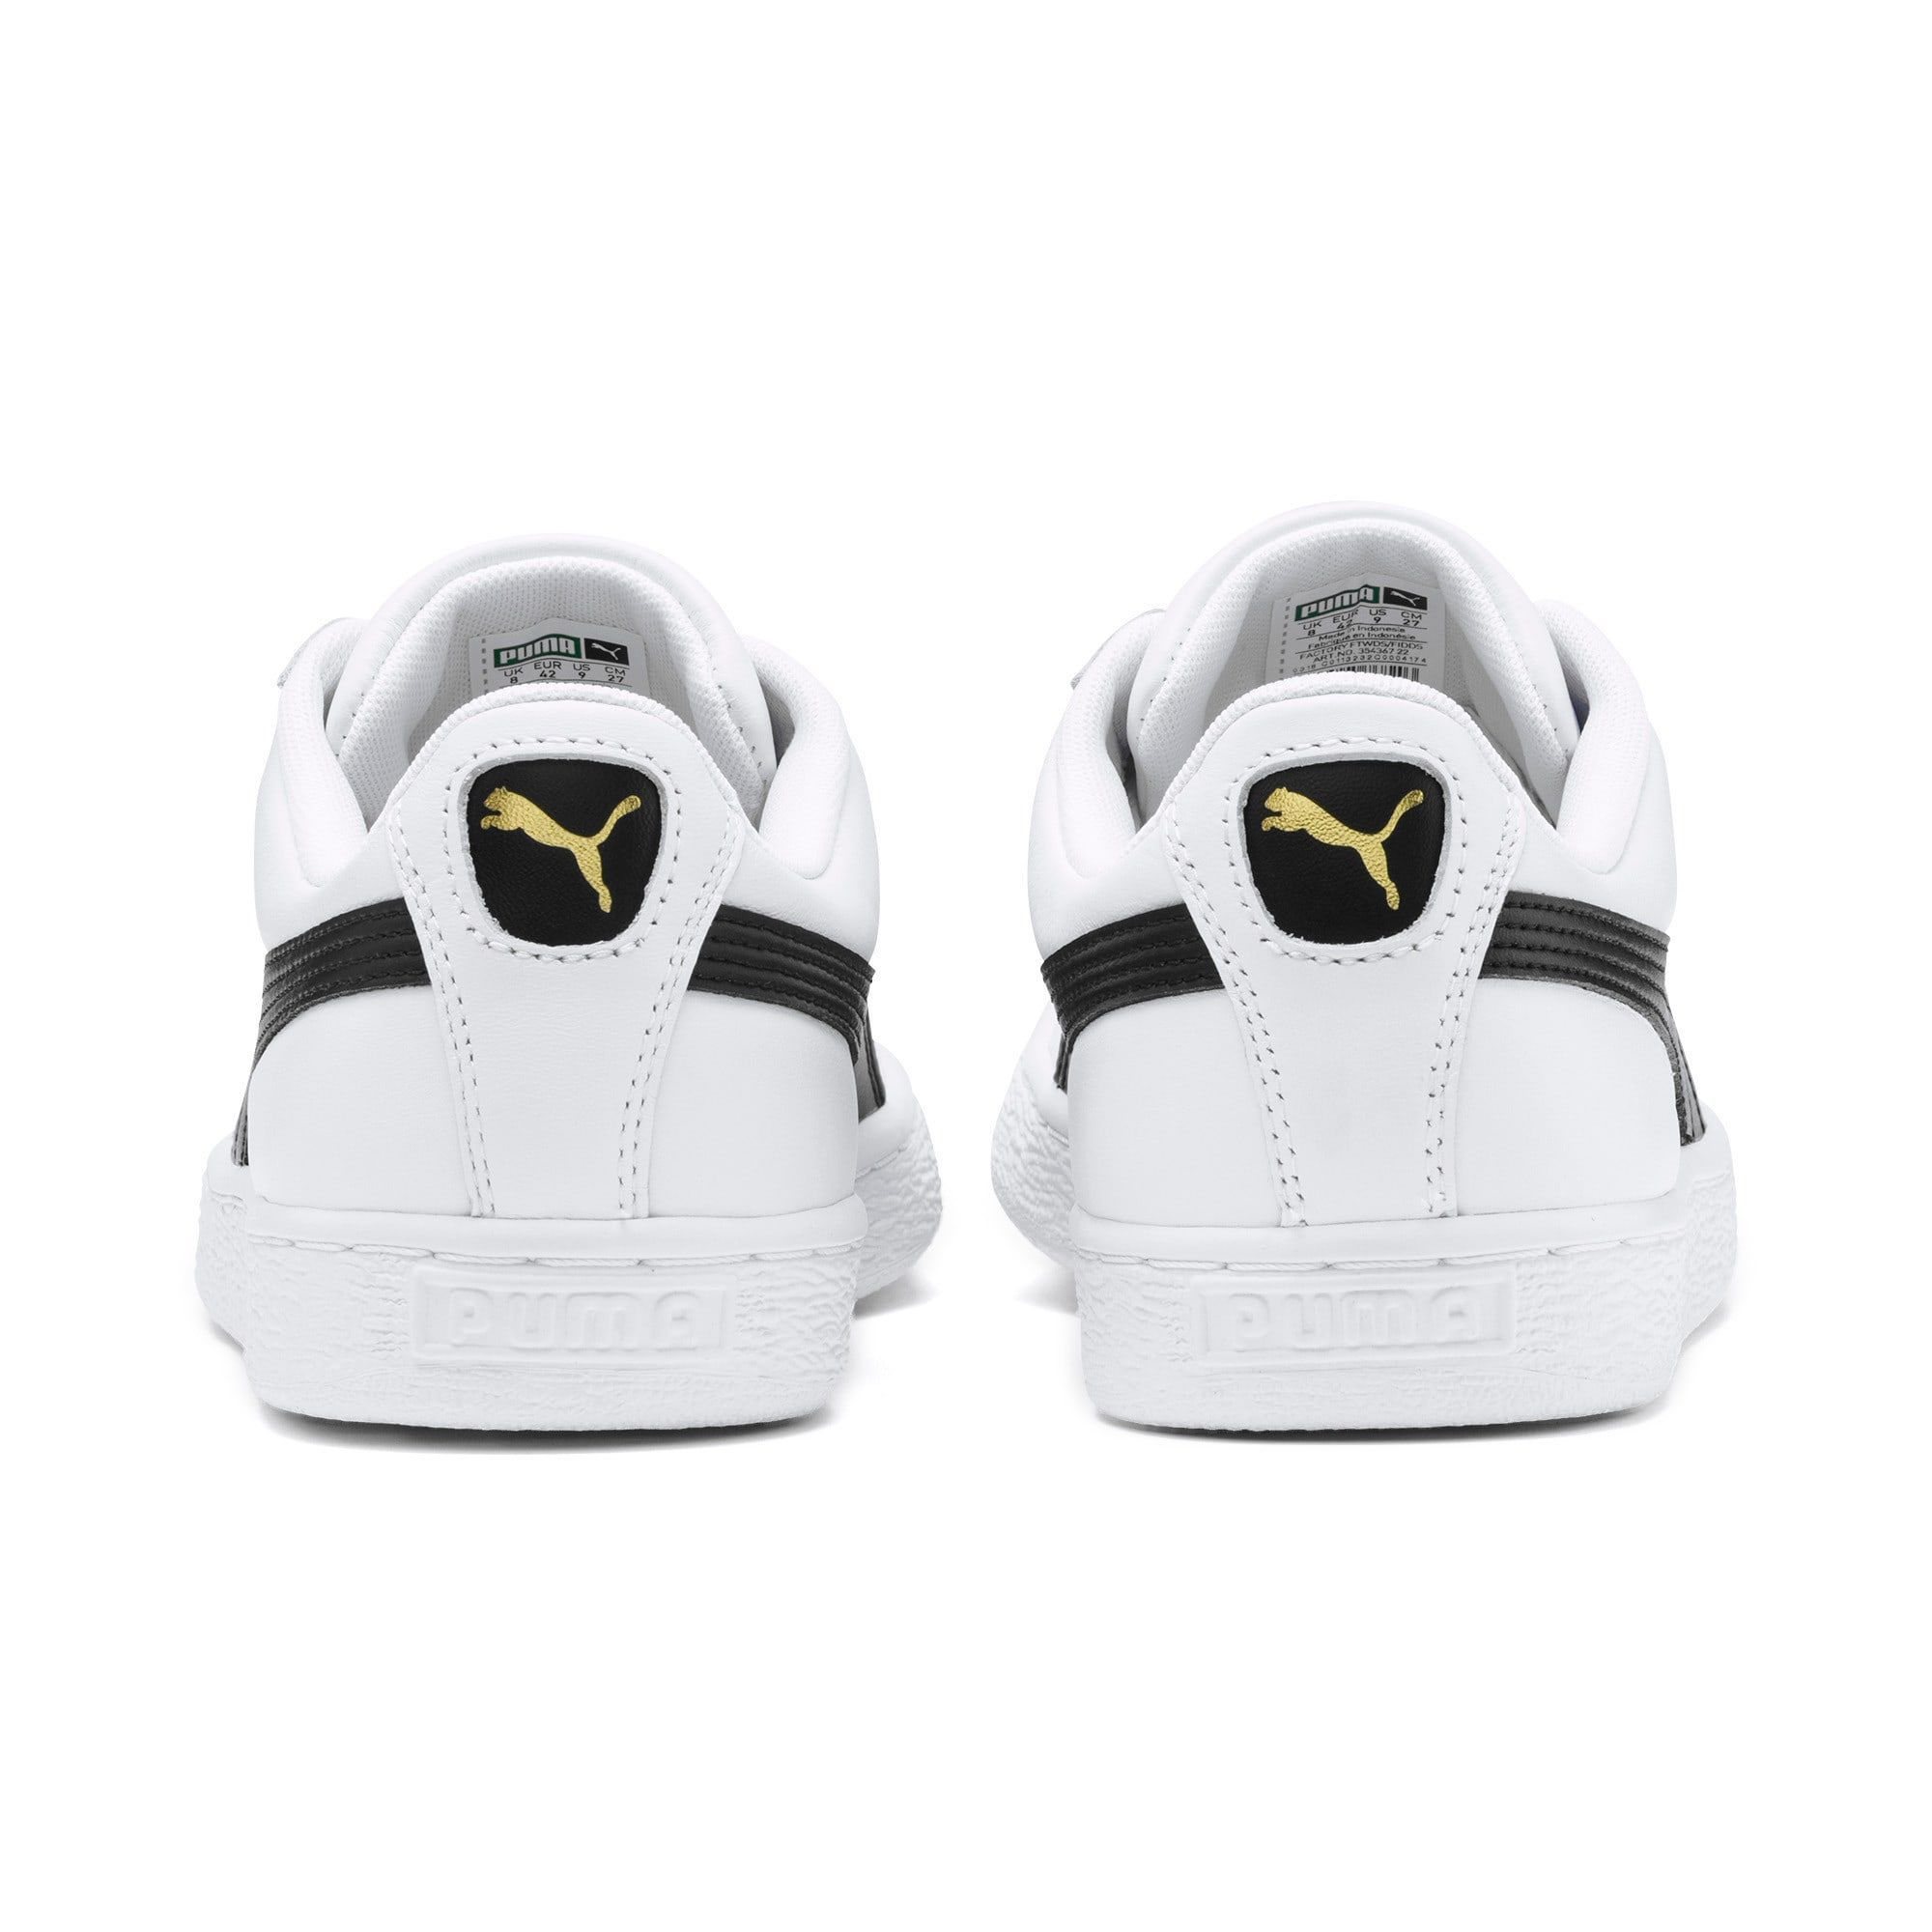 PUMA Basket Classic Lfs Men's Shoe